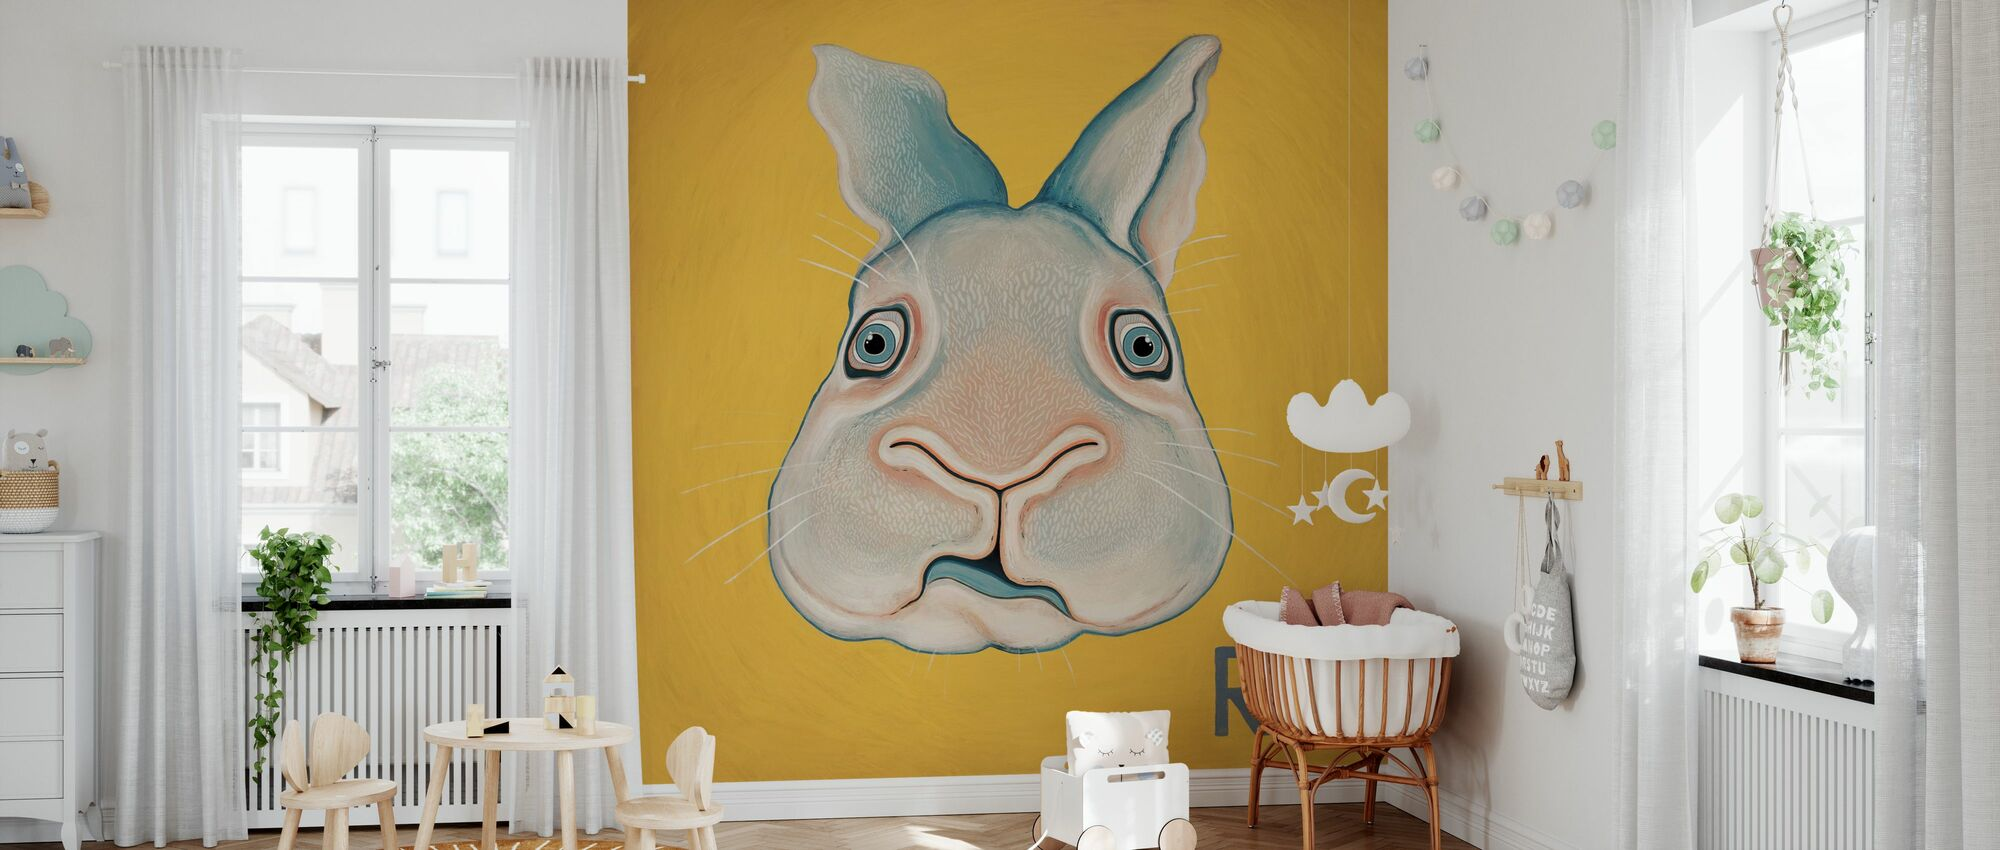 Rabbit - Wallpaper - Nursery